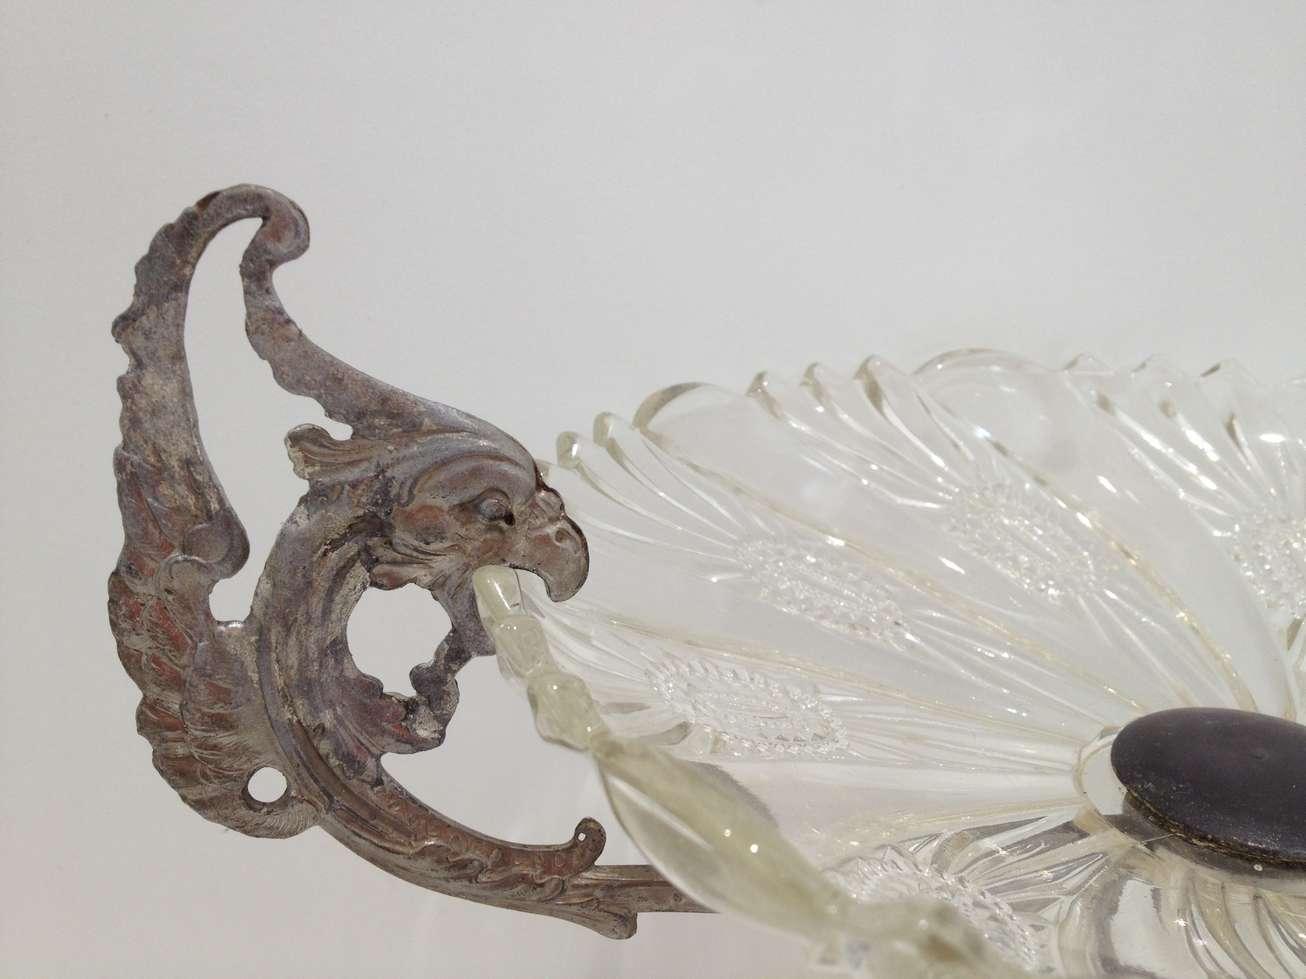 coupe-regule-verre-metal-art-restaurarte-reparation.jpg